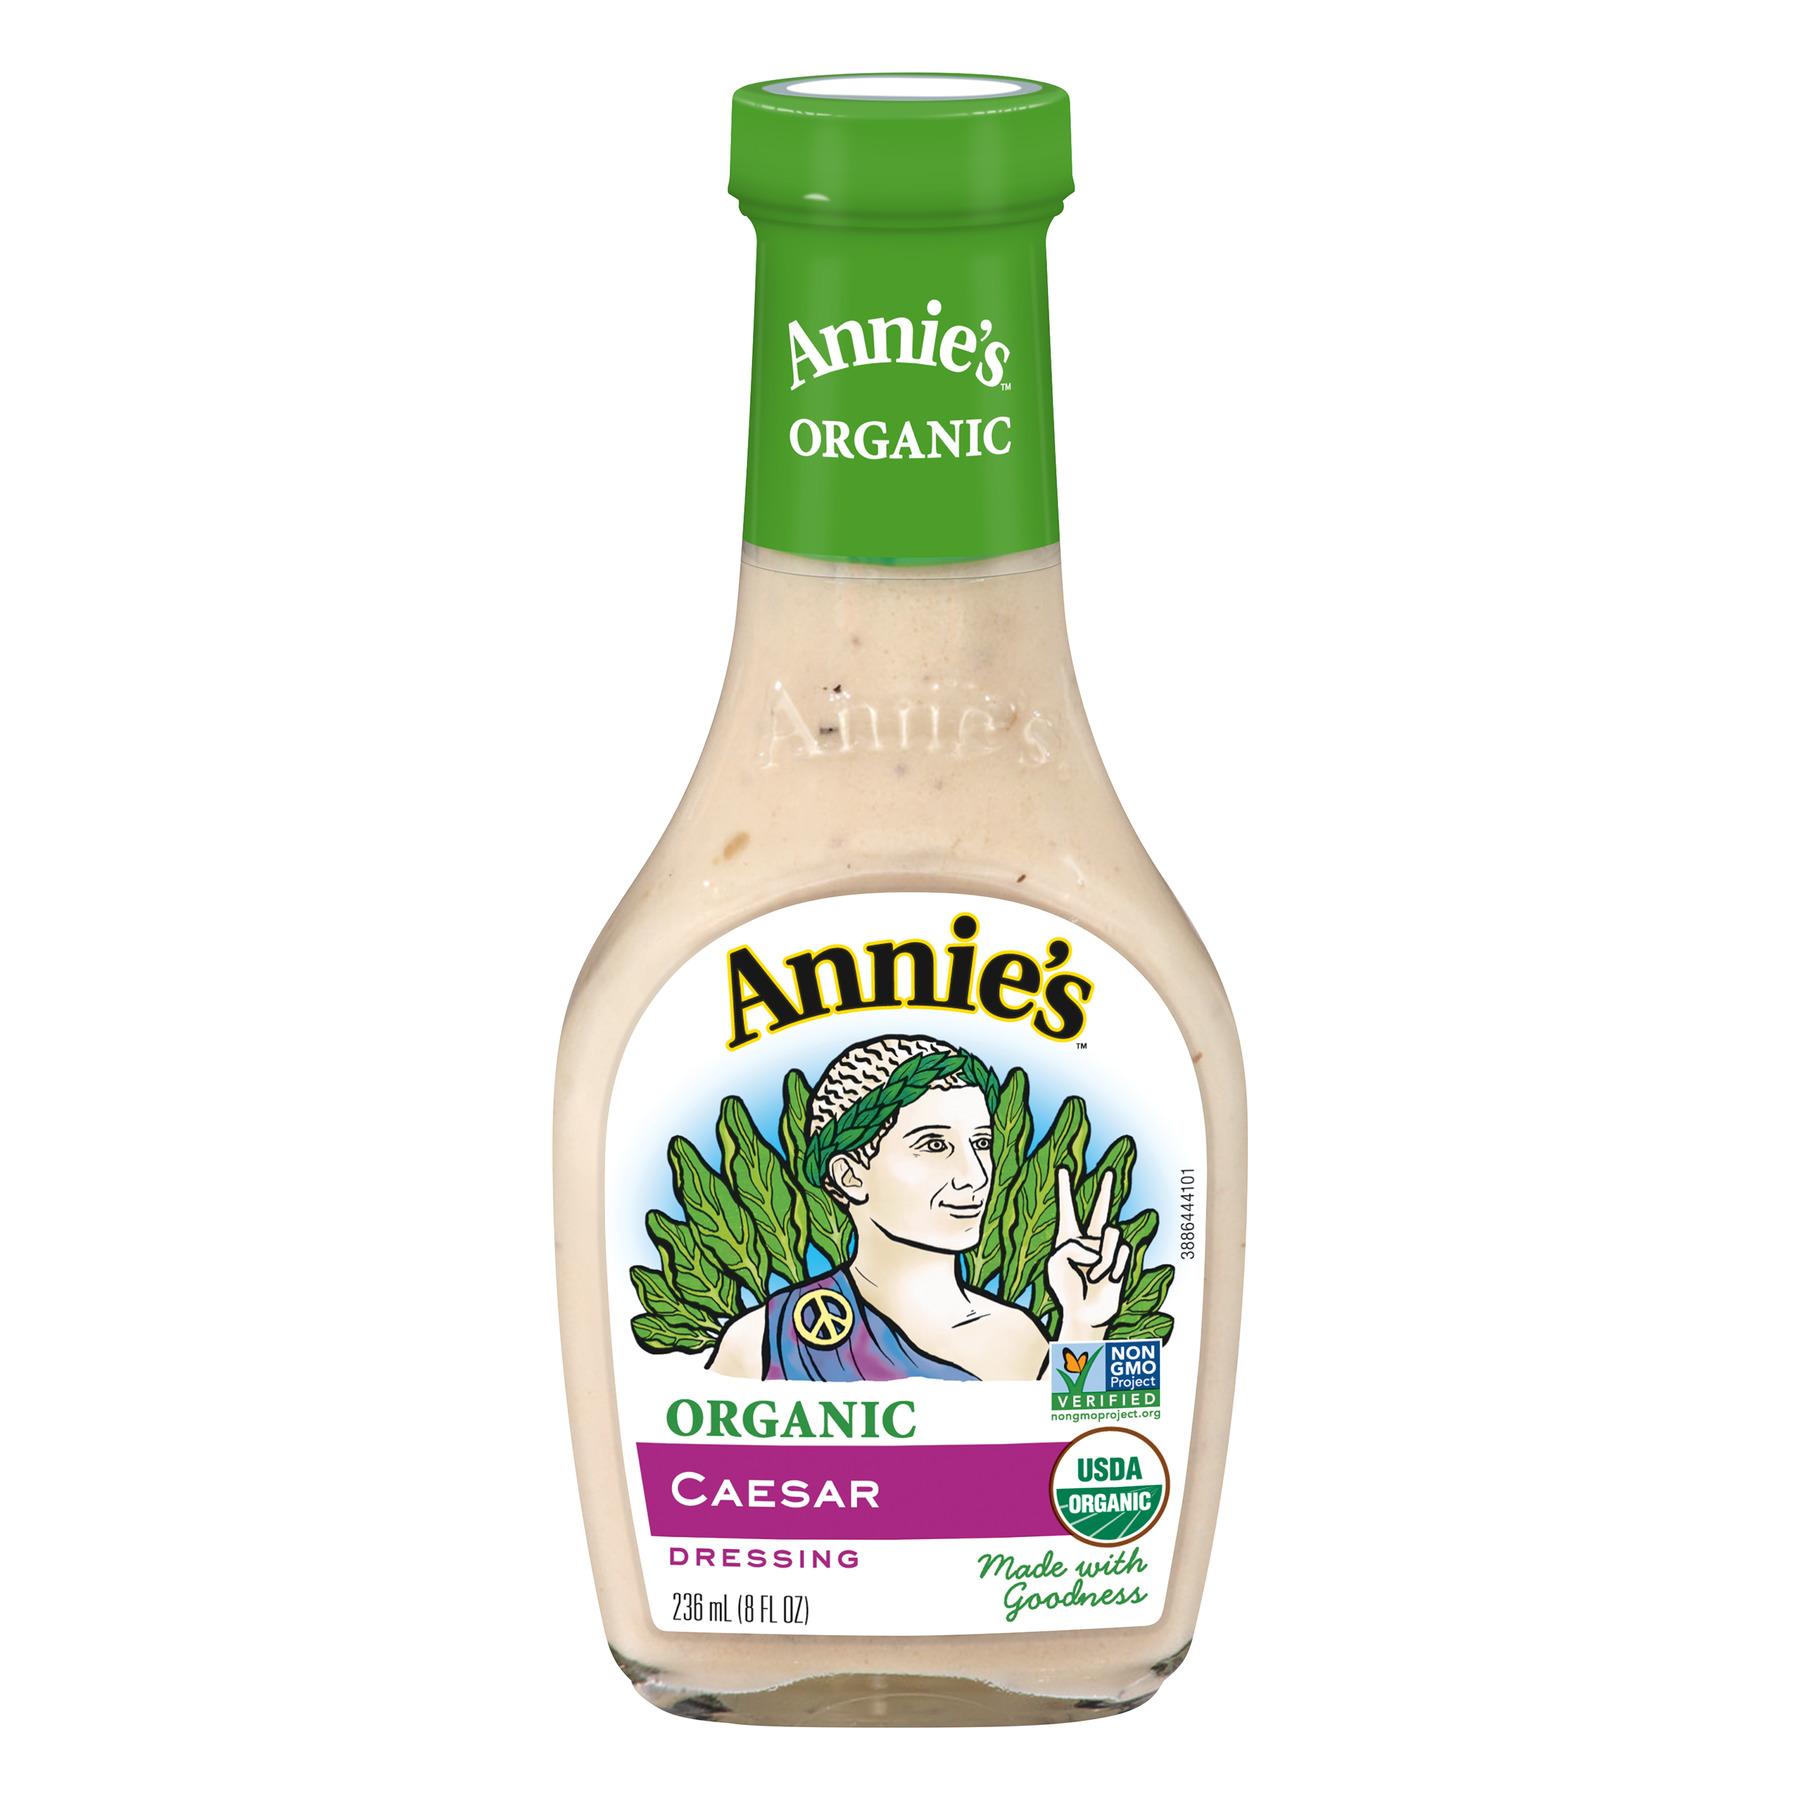 Annie's Organic Caesar Dressing Made wWith Goodness, 8 fl oz Bottle